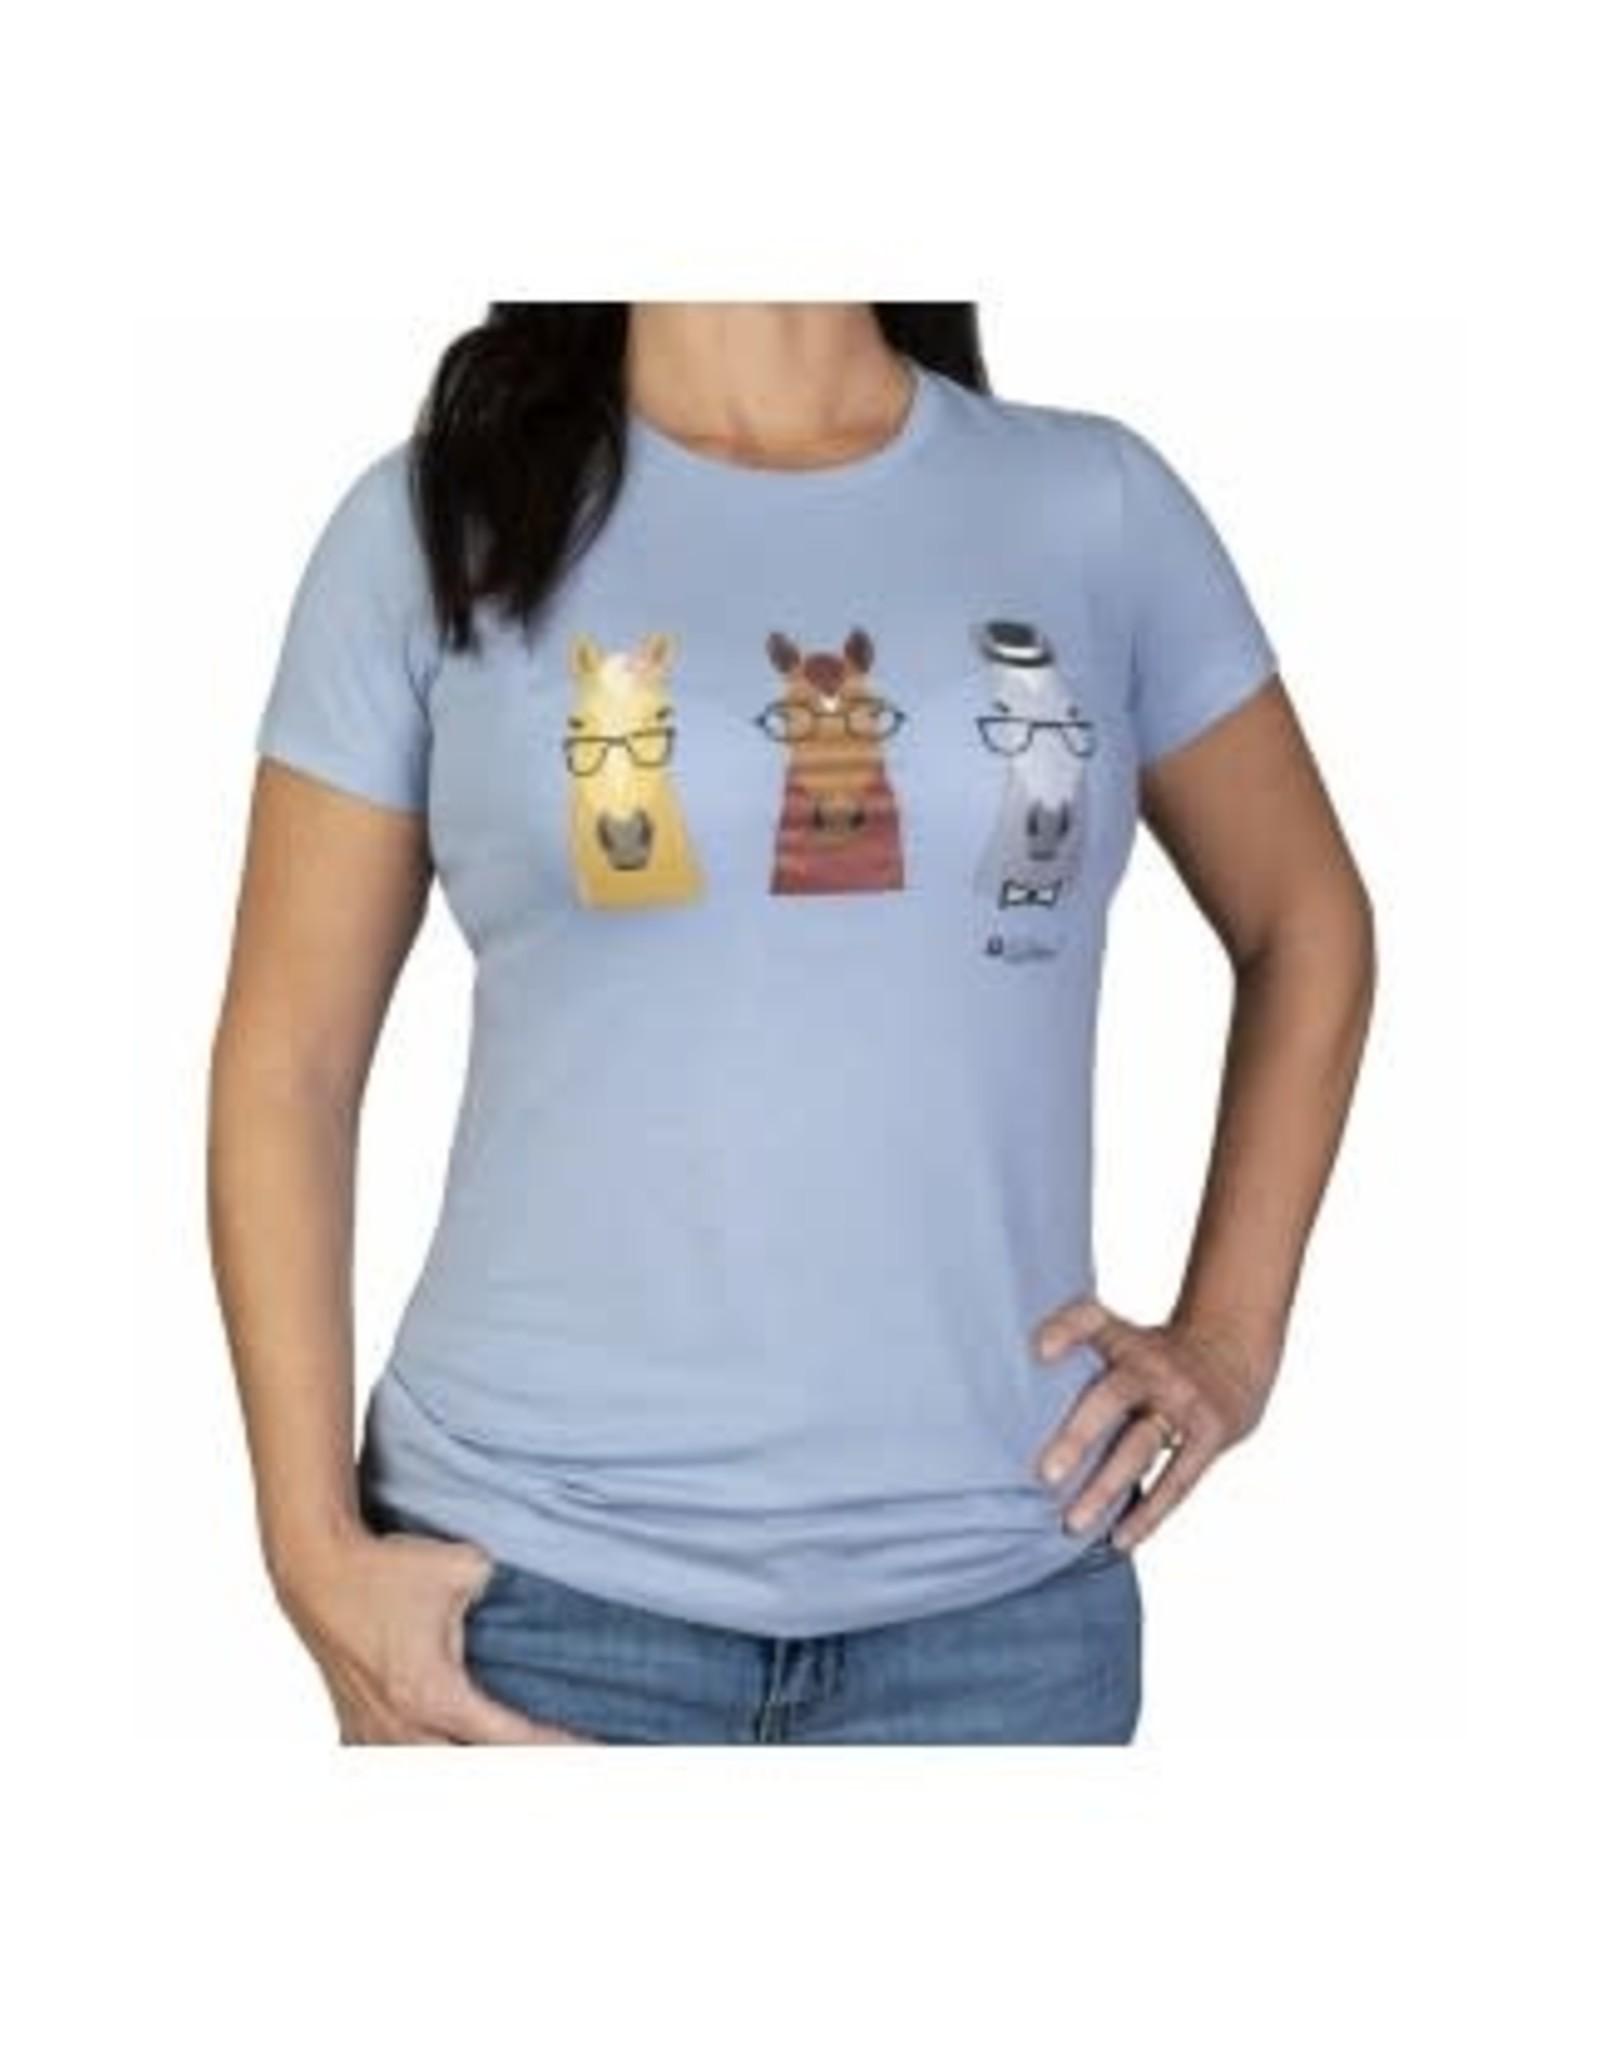 Union Hill Hip Horses Tee Shirt